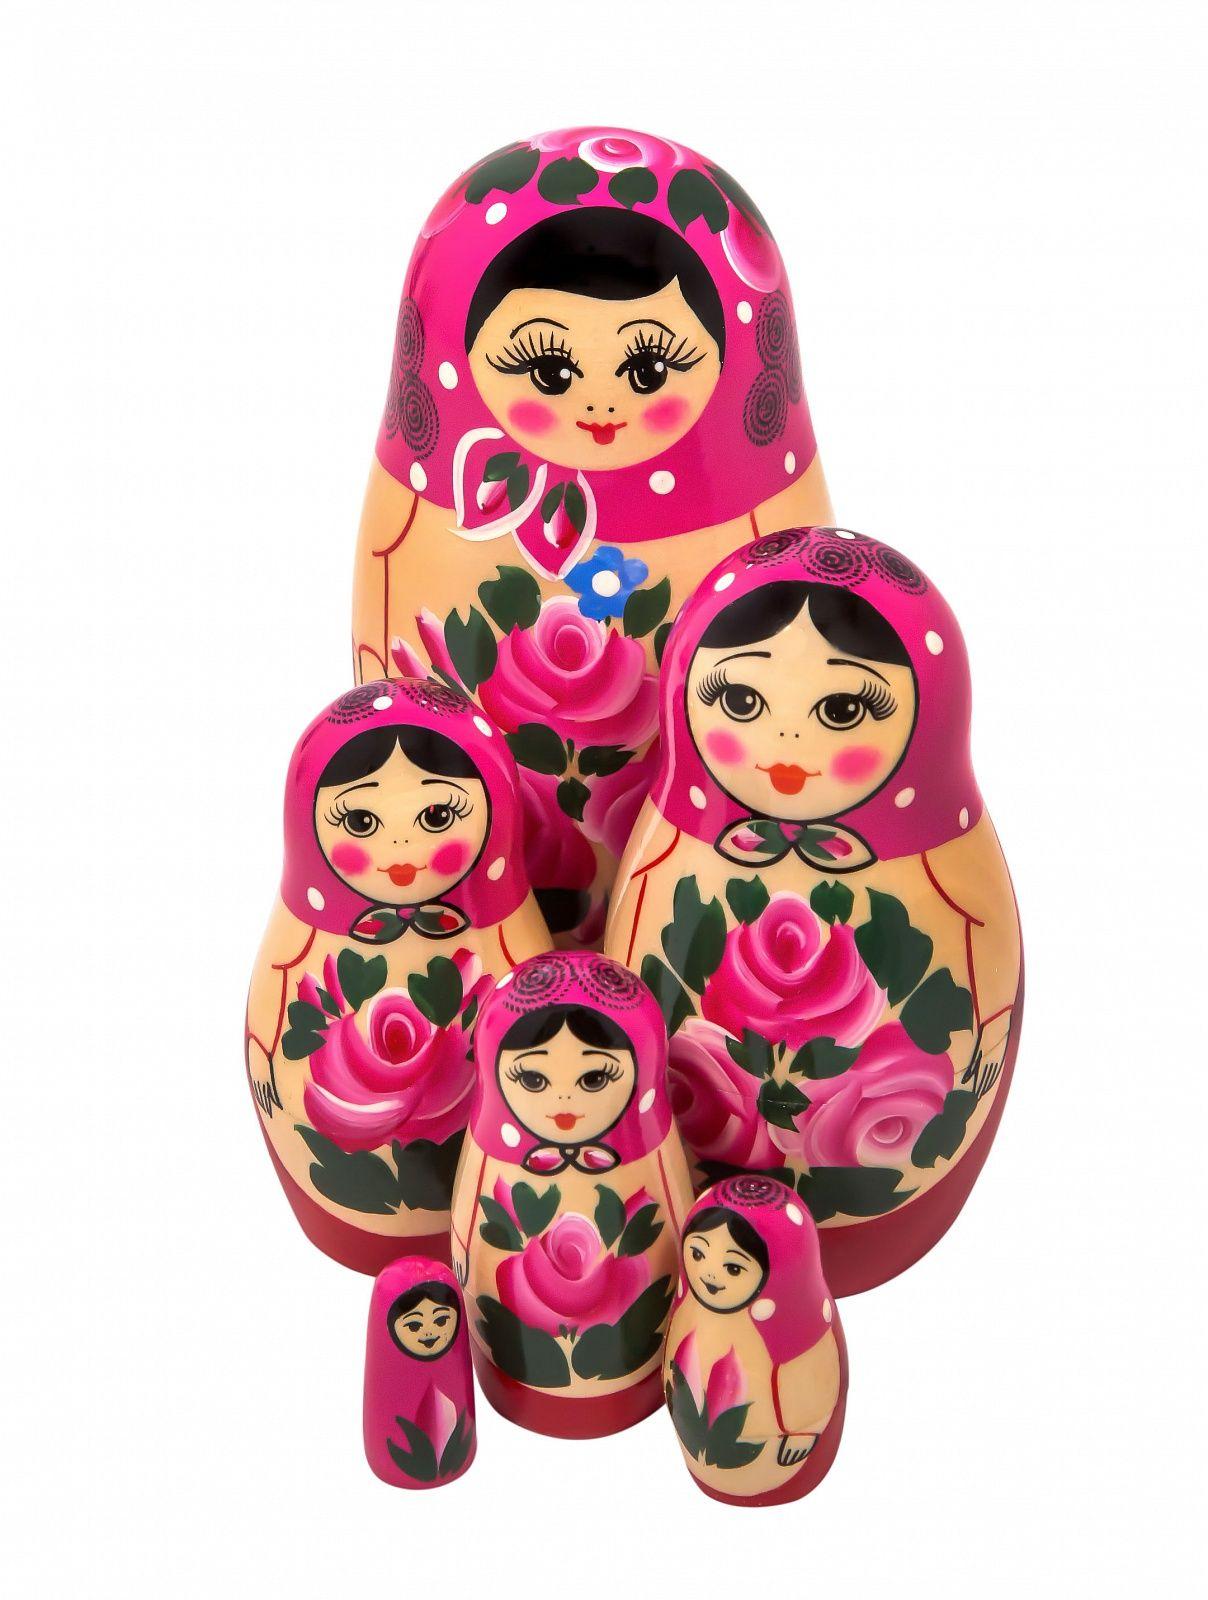 Khokhloma painting / Matryoshka non-traditional 6 dolls